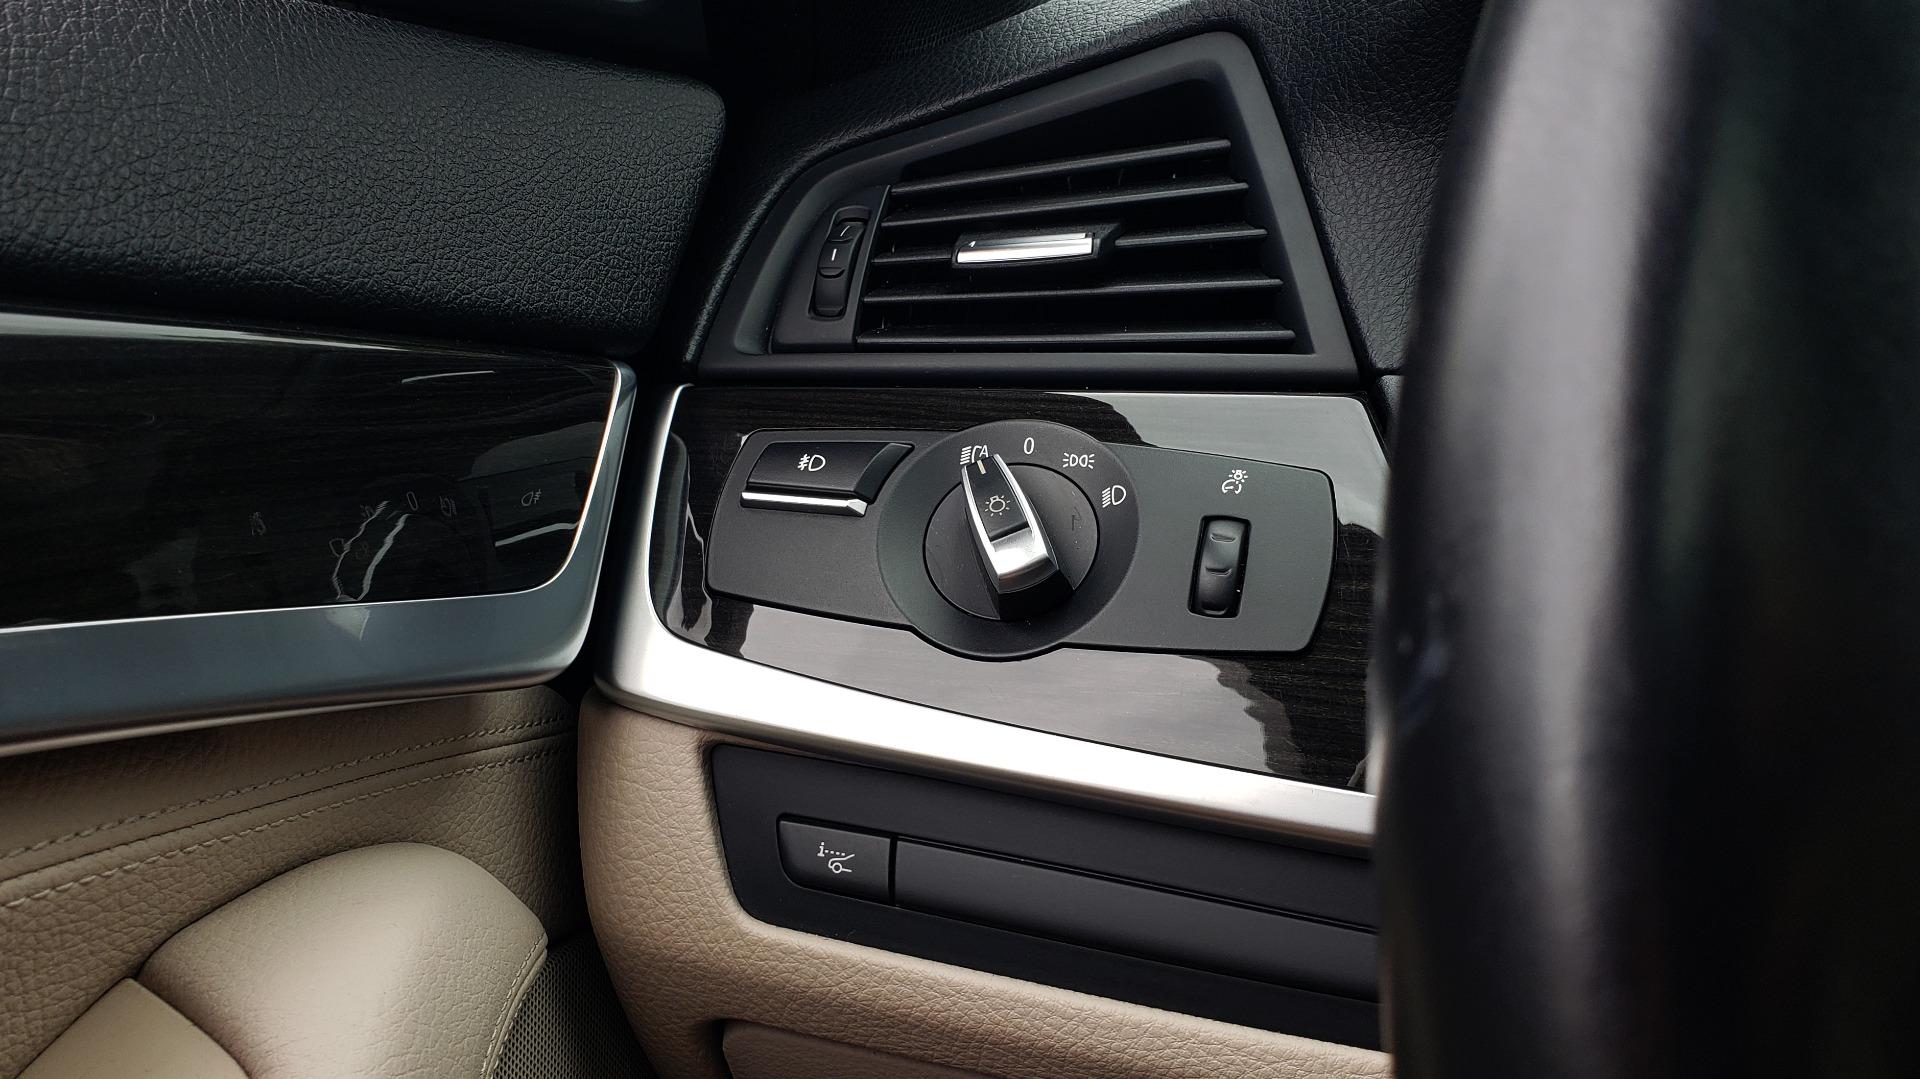 Used 2012 BMW 5 SERIES 550I M SPORT / NAV / CONV PKG / SUNROOF / PREM SND / REARVIEW for sale Sold at Formula Imports in Charlotte NC 28227 32